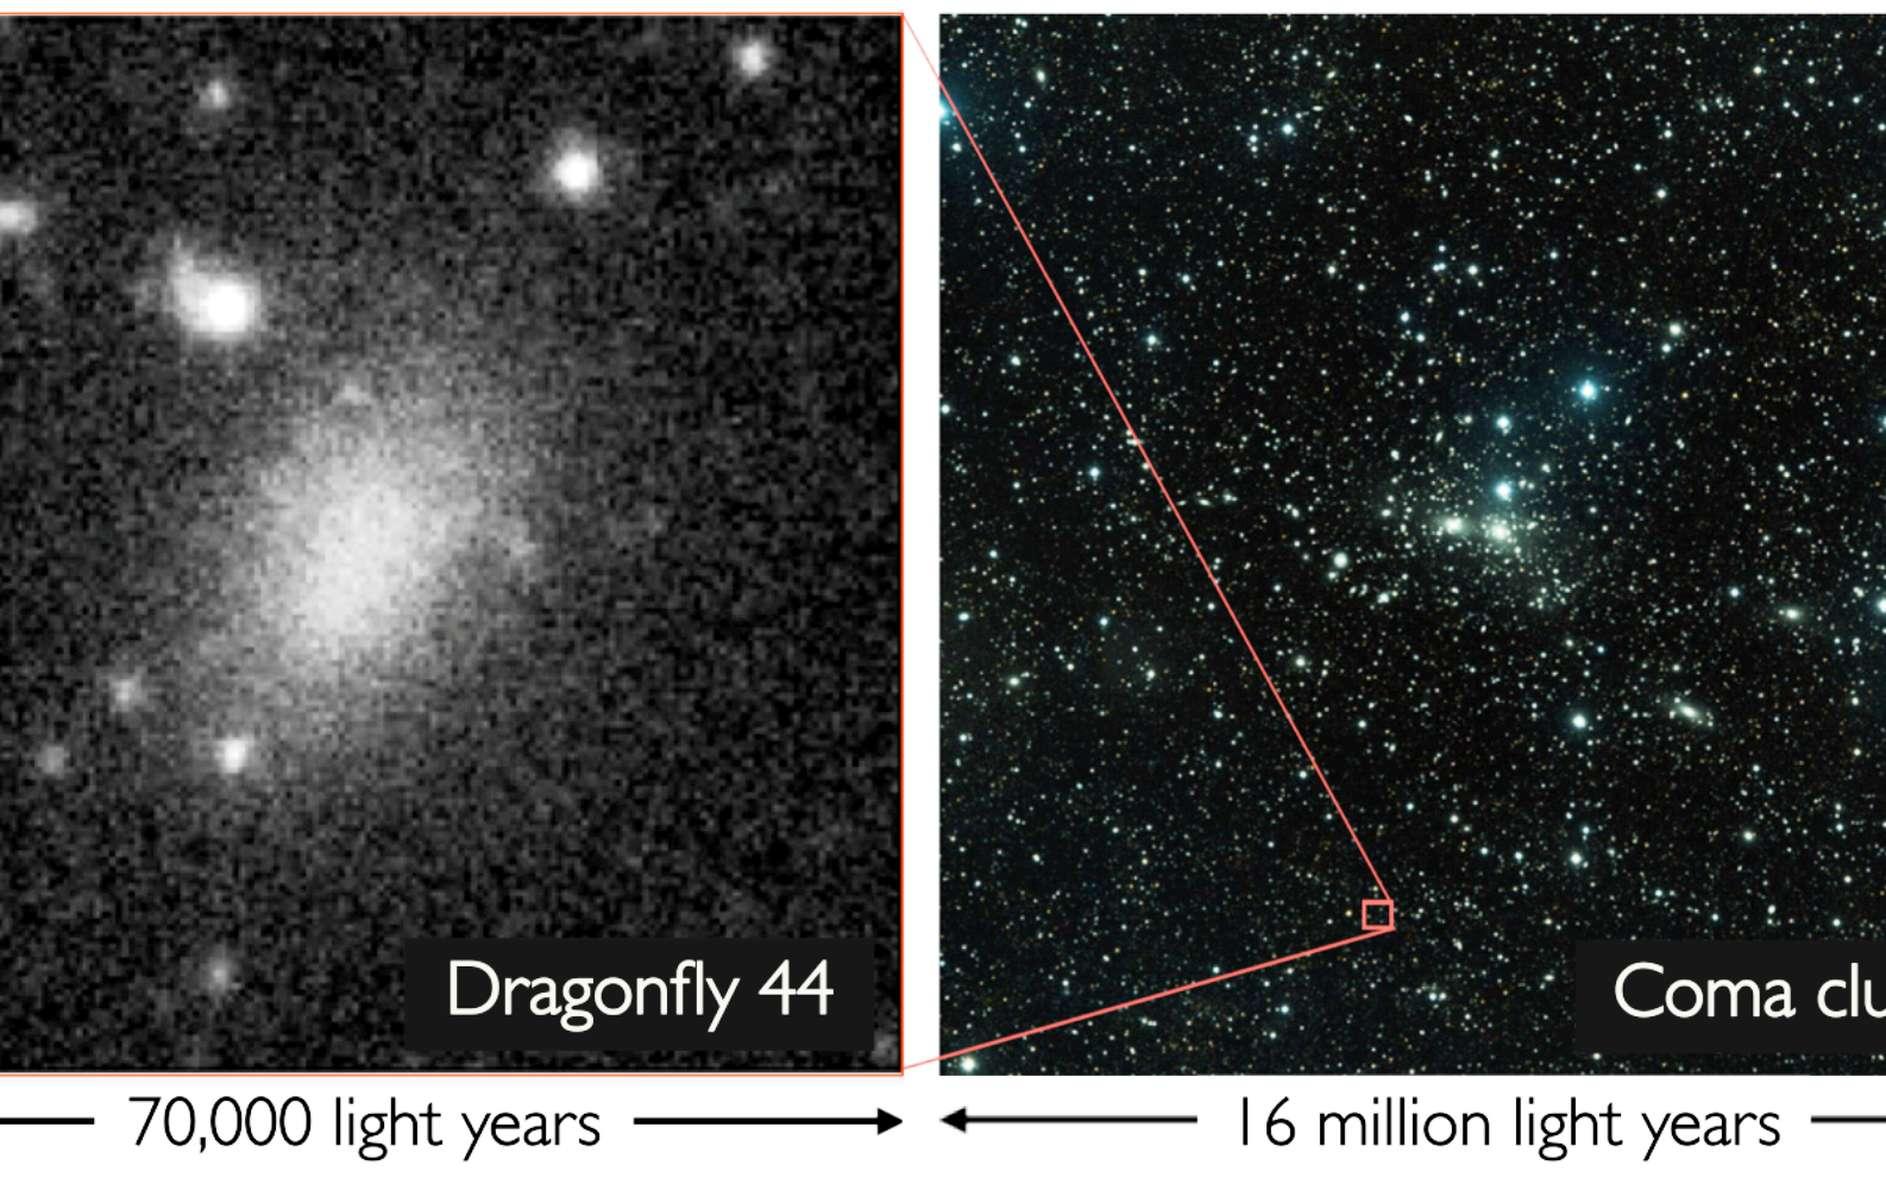 Un exemple de galaxie ultradiffuse, Dragonfly 44, observée dans l'Amas de Coma. © Pieter van Dokkum, Roberto Abraham, Jean Brodie